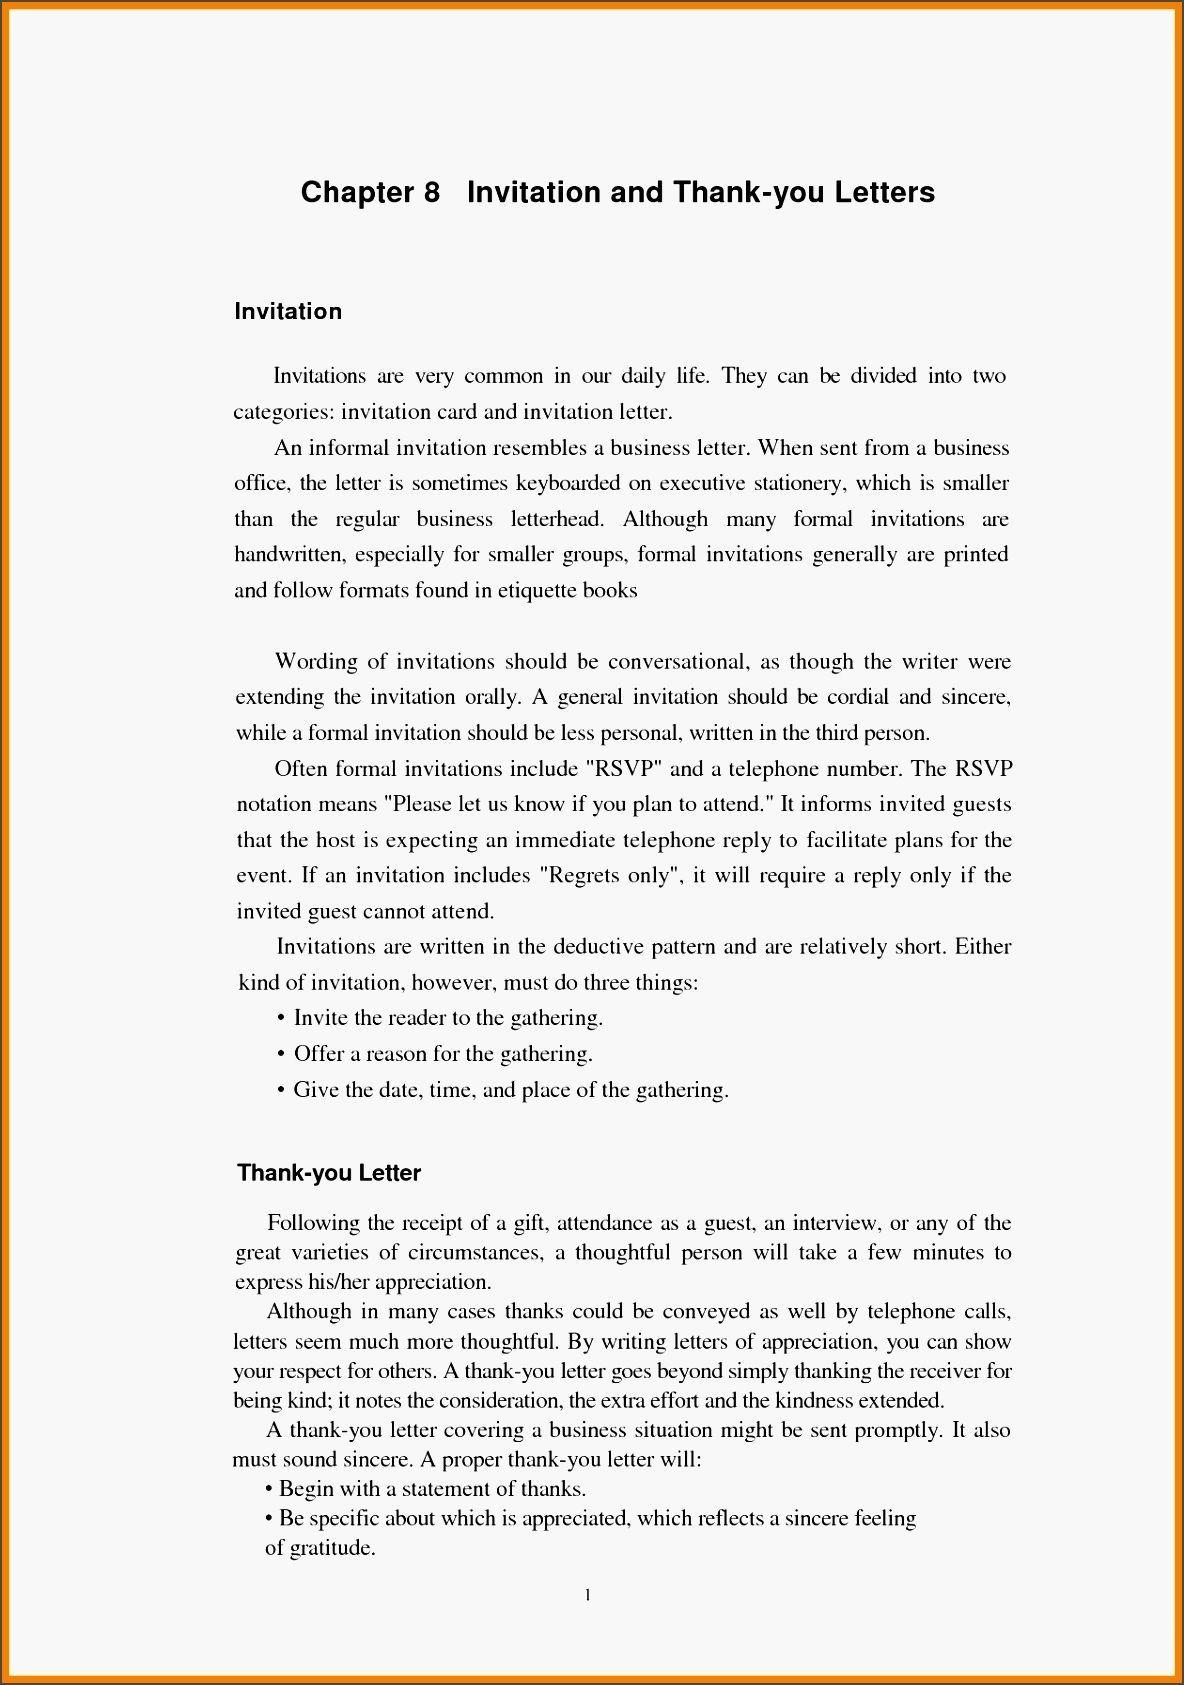 FormalInvitation Dinner invitation template, Thank you